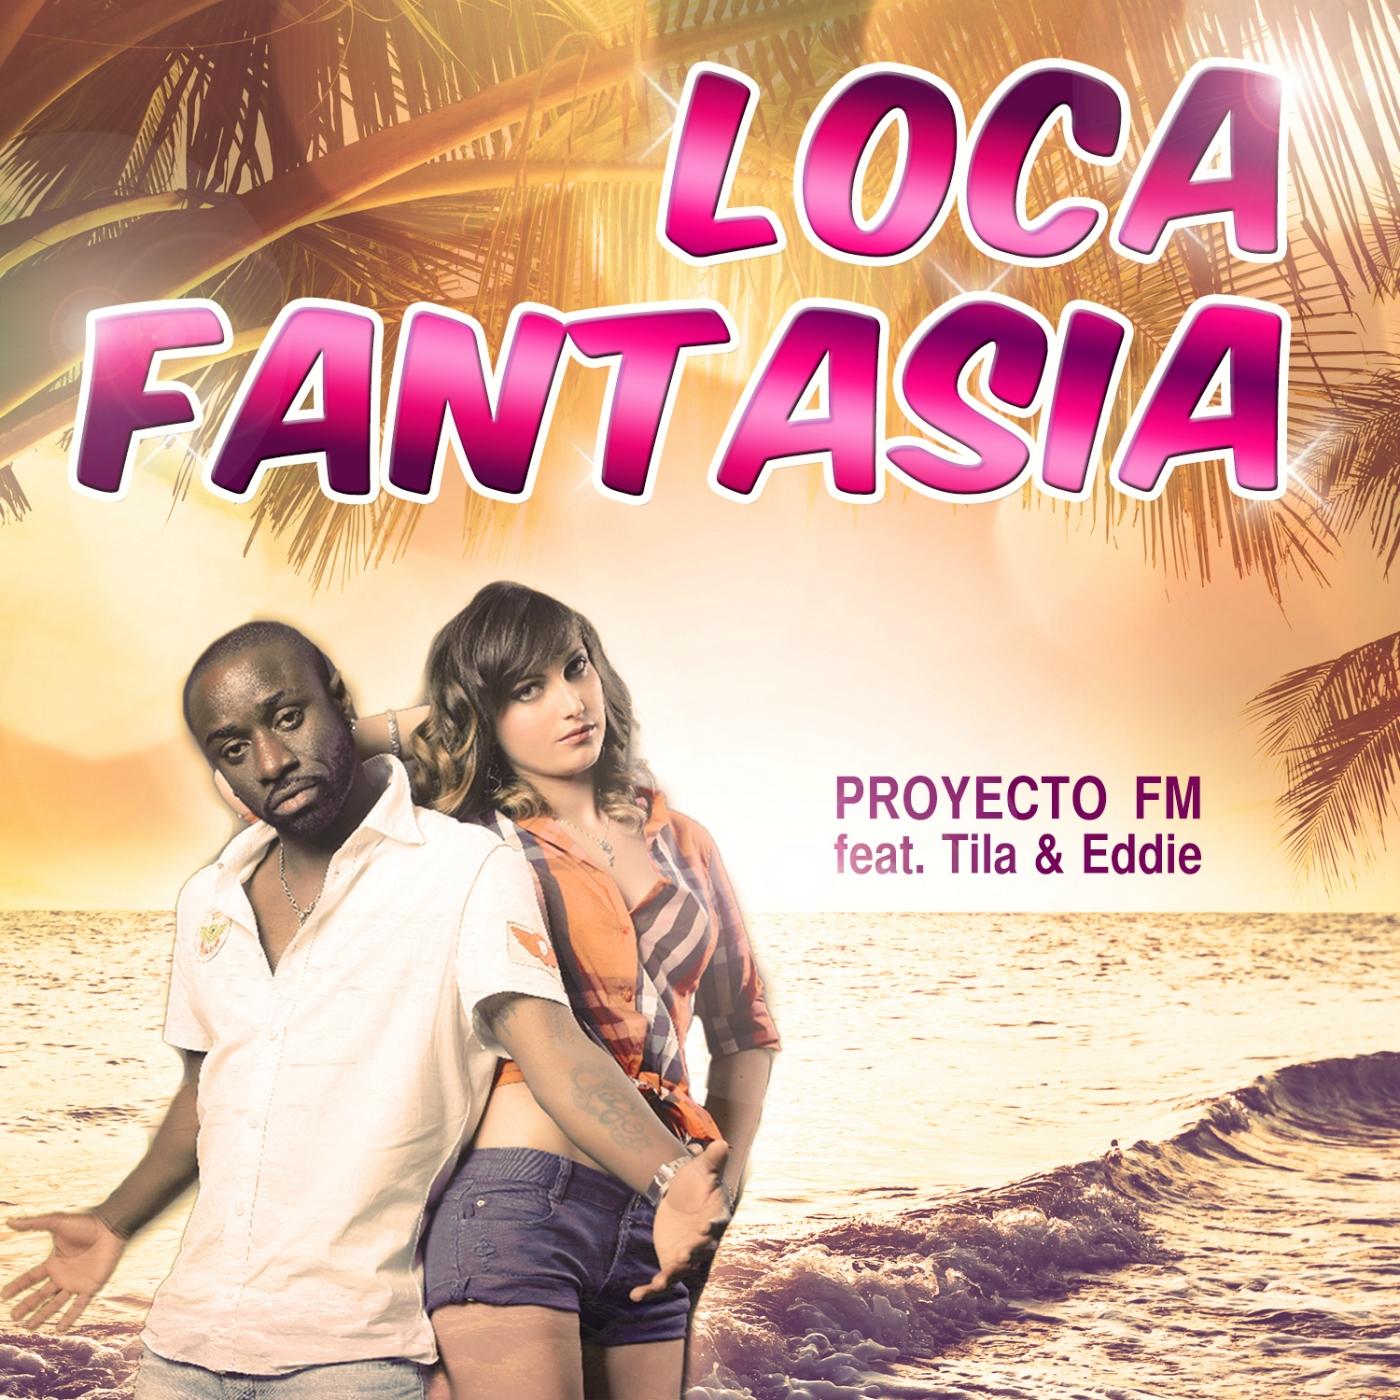 Proyecto FM - Loca Fantasia Feat. Tila & Eddie (Matthew Bee Club Edit)